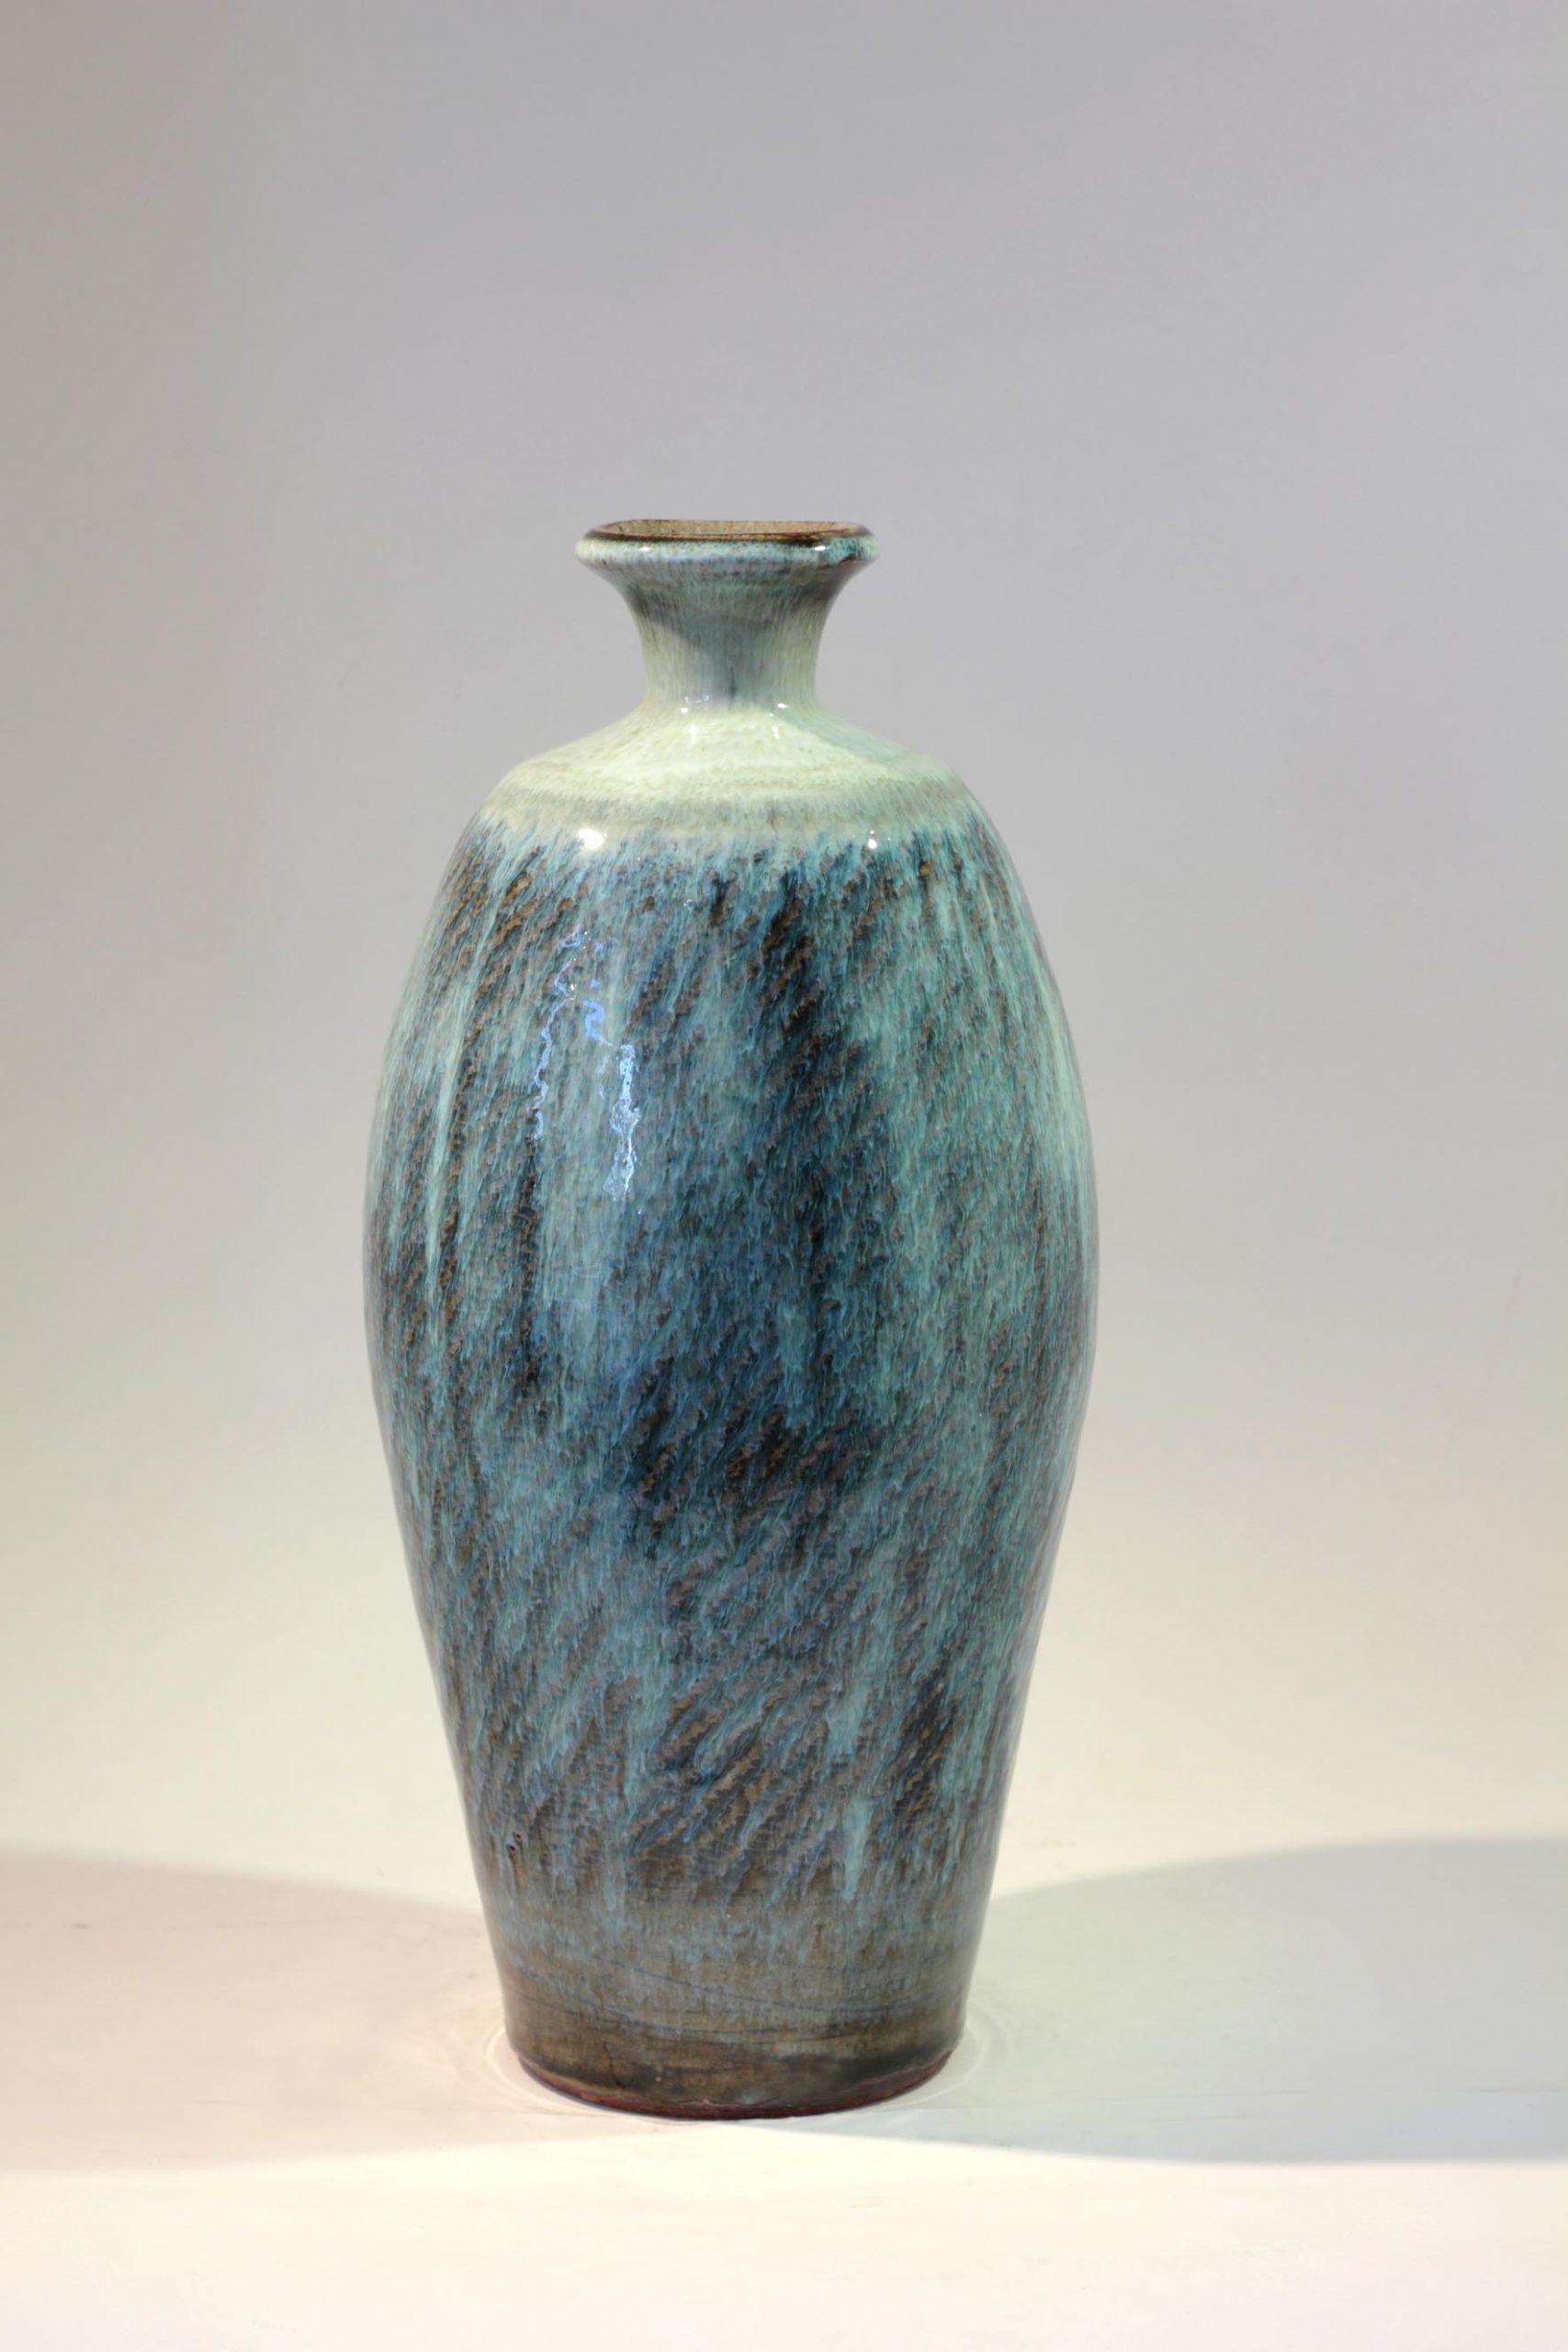 William Plumptre 13. Thrown Bottle Stoneware 33x15x15cm